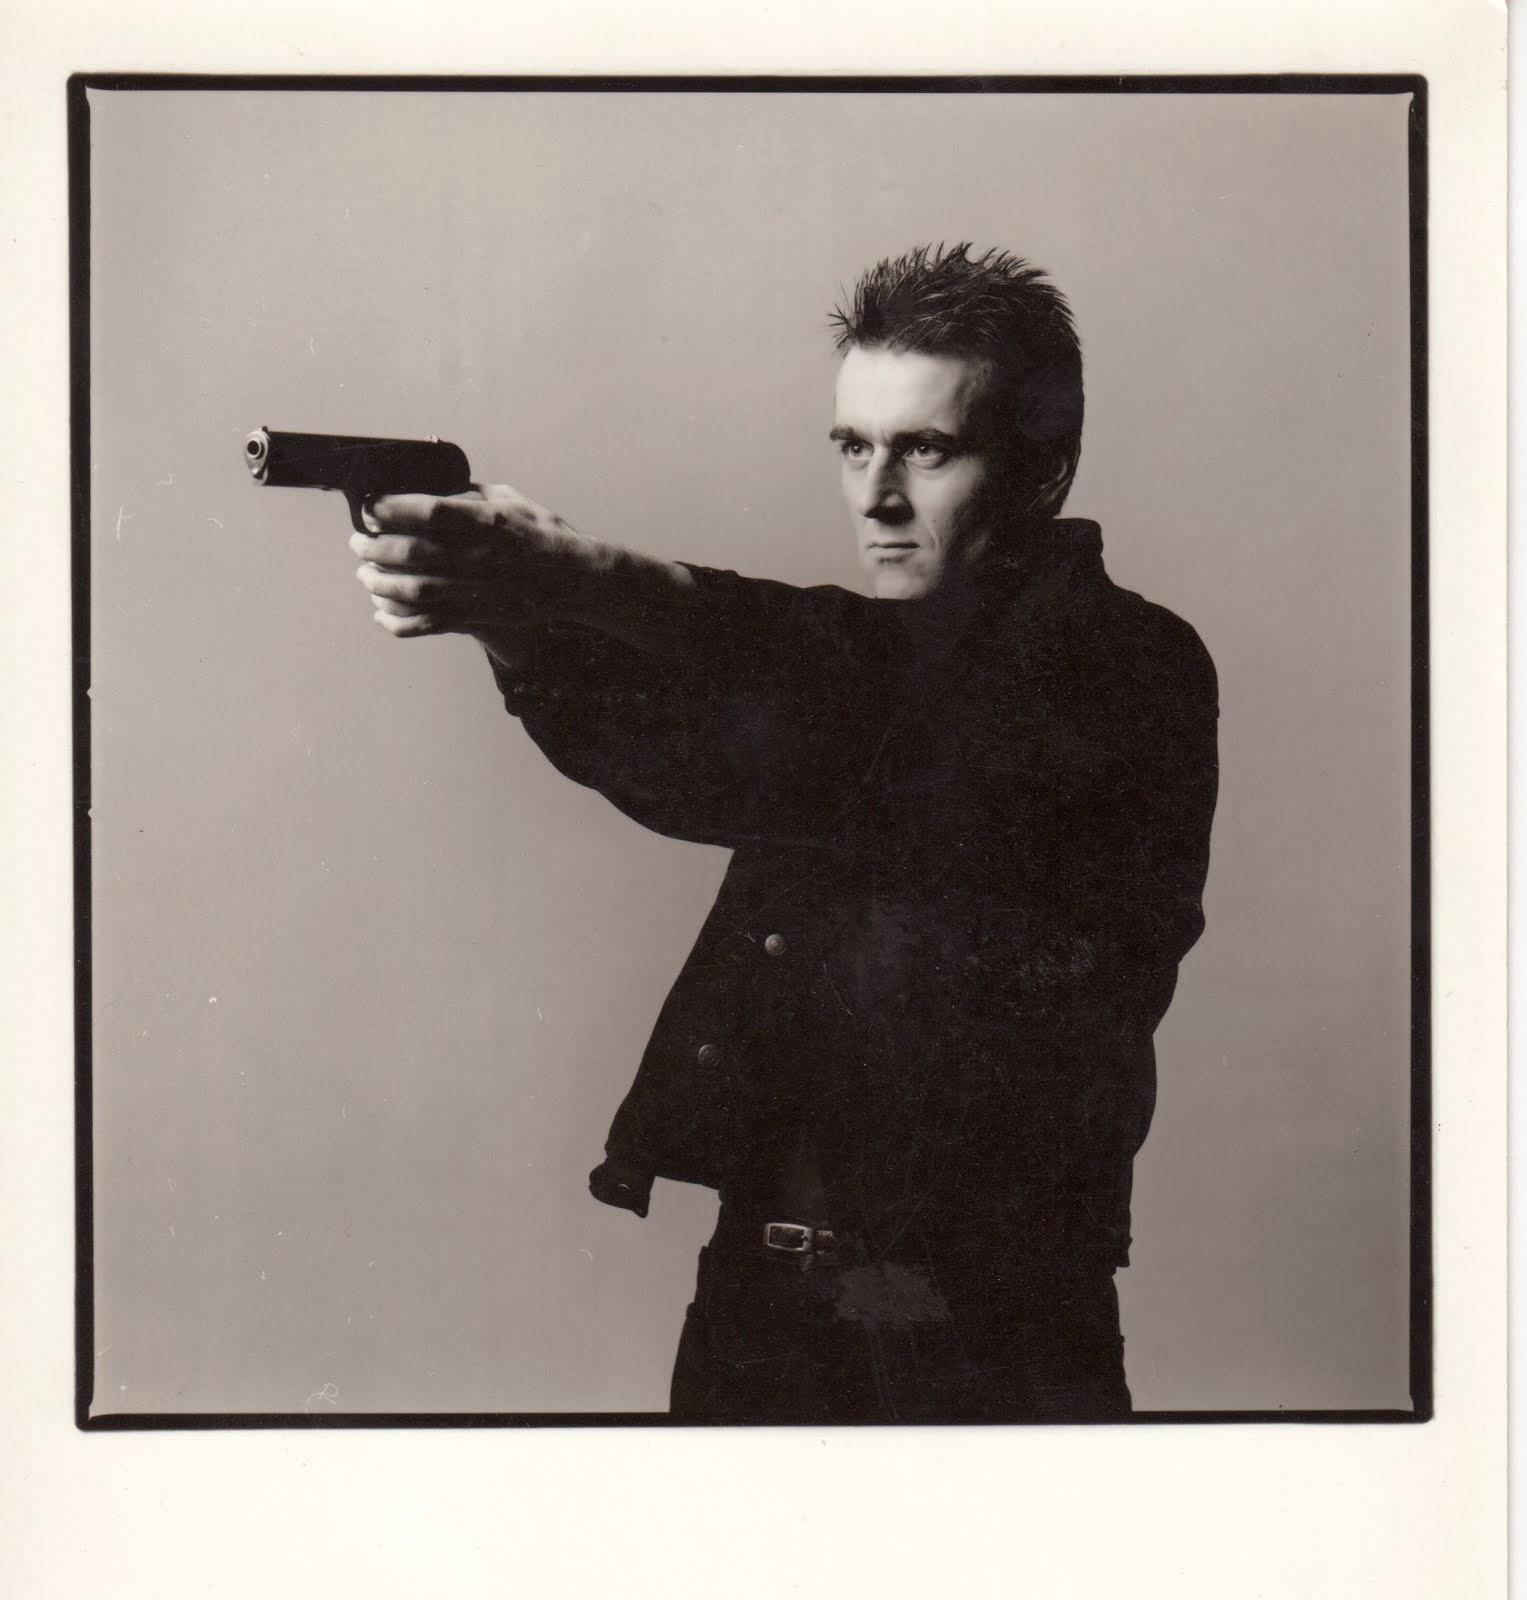 Zbigniew Karkowski shooting the bullshit